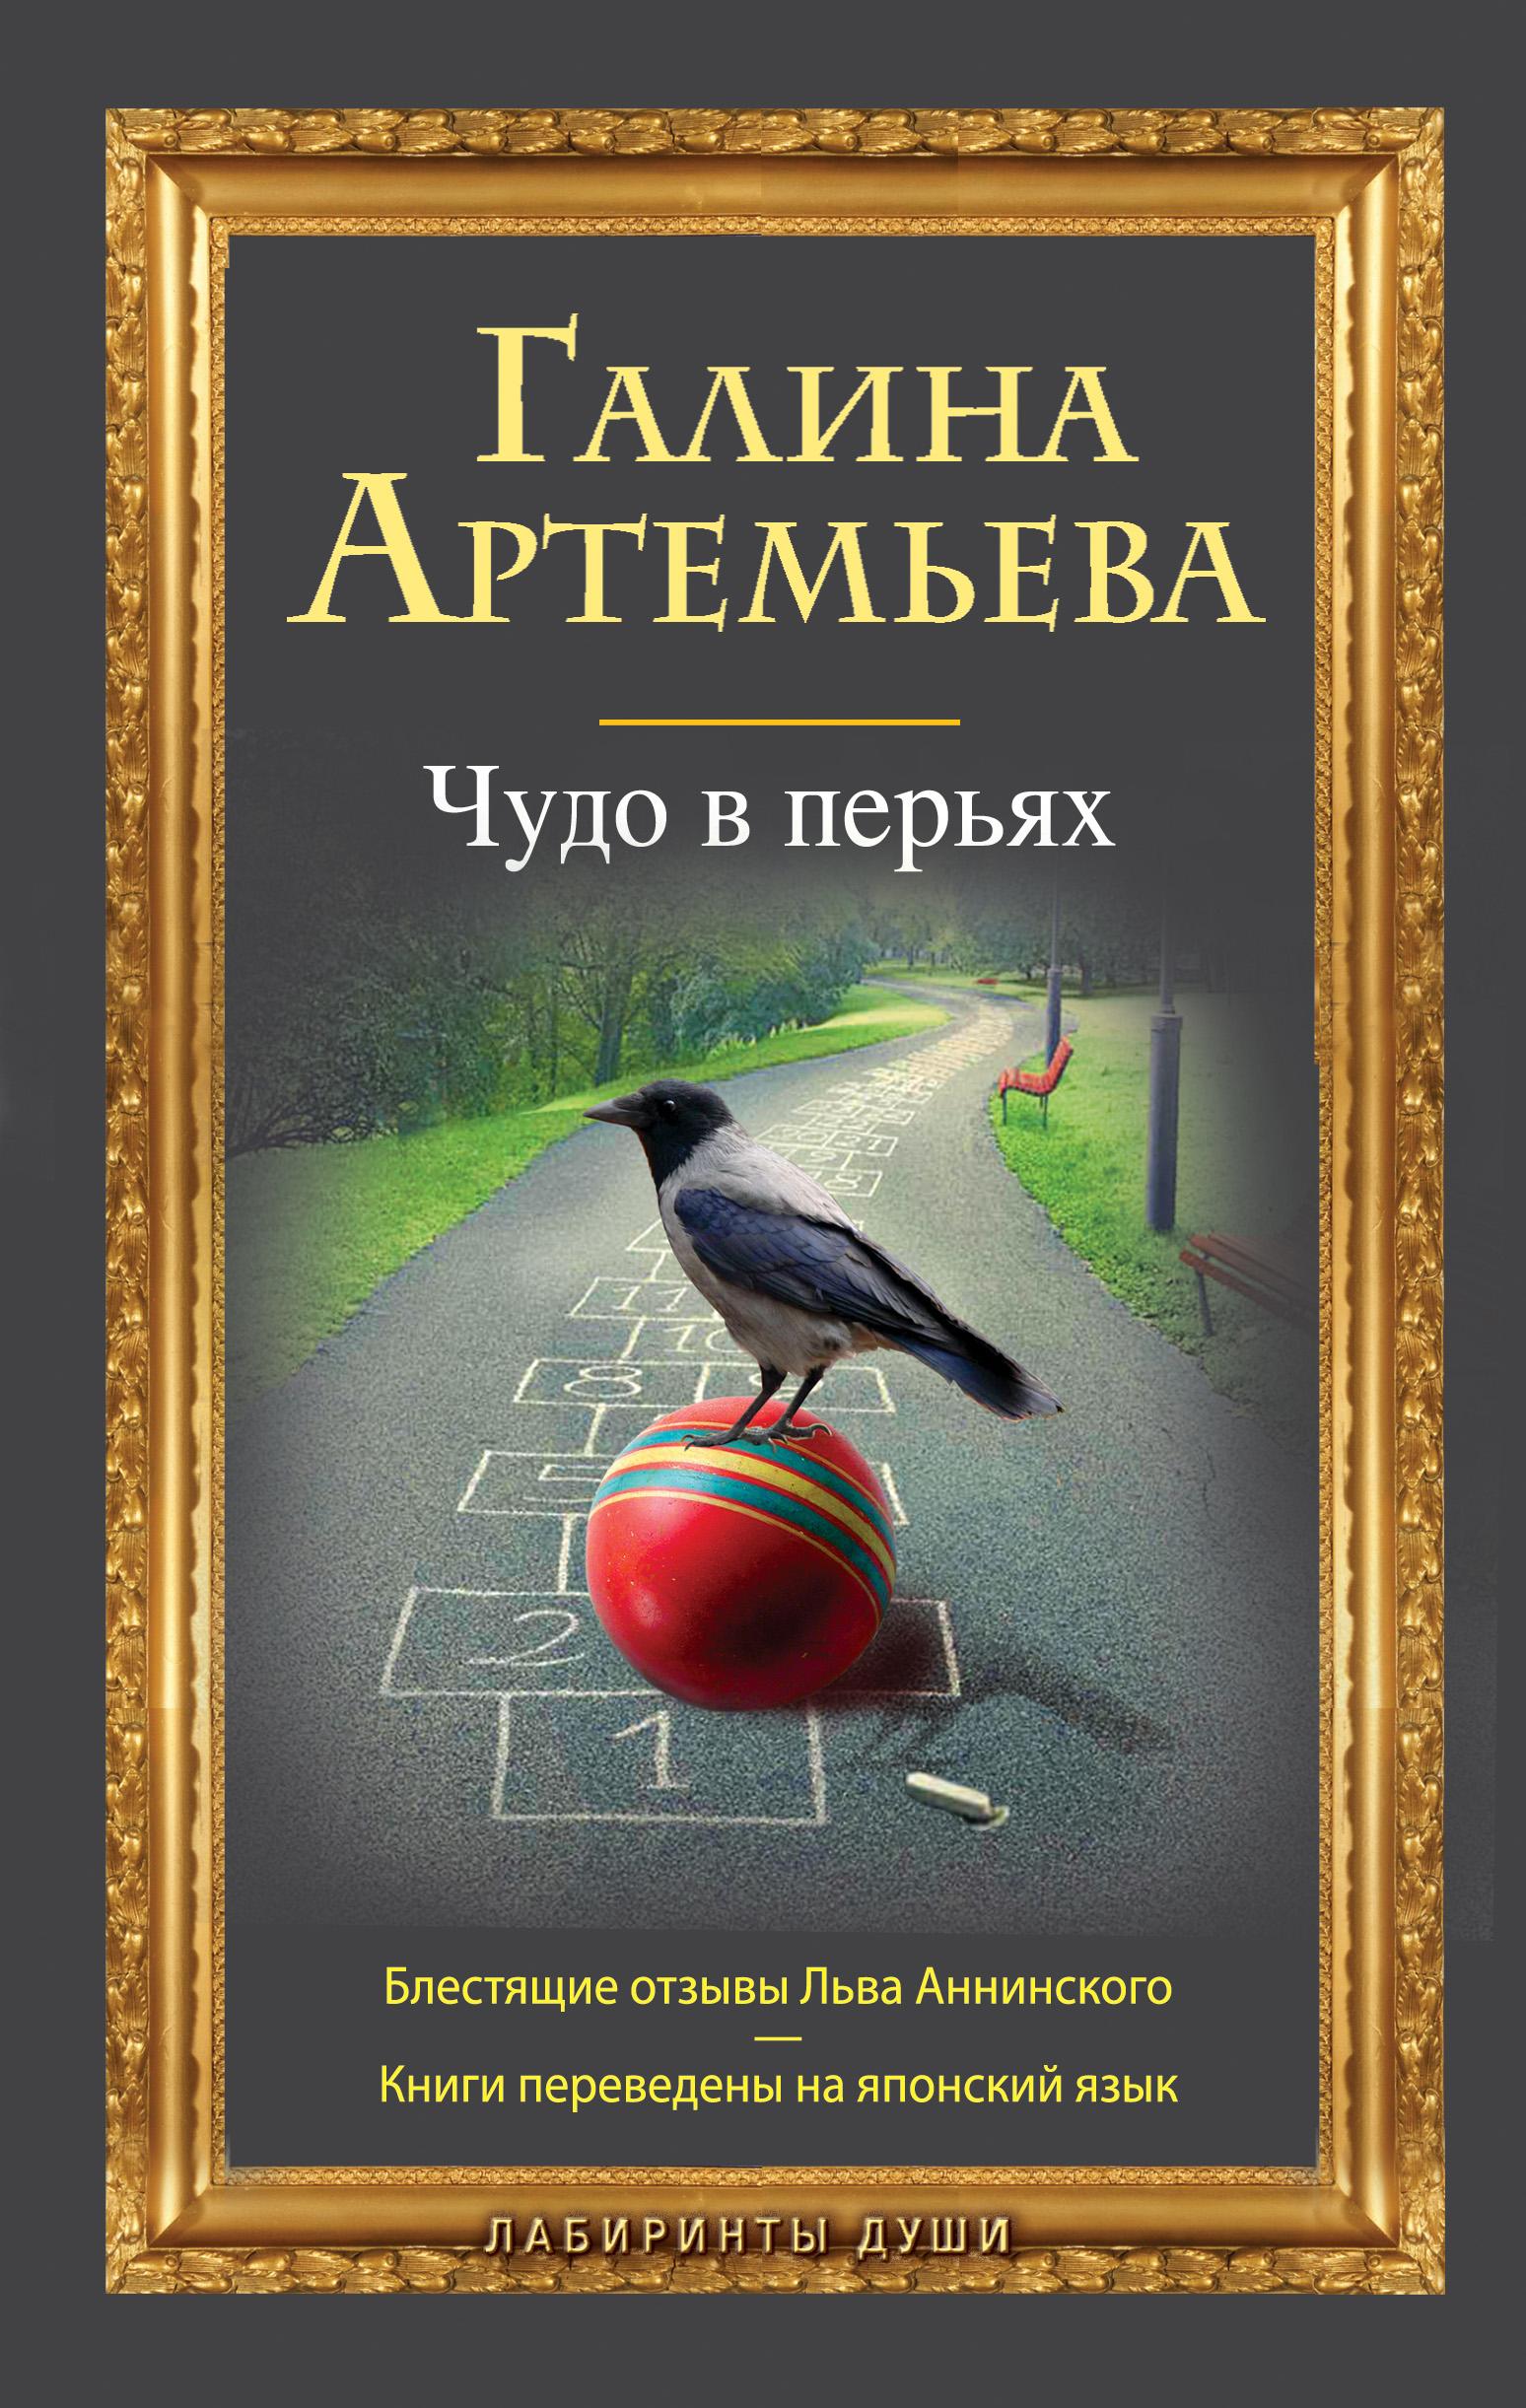 Галина Артемьева Волчицы галина артемьева волчицы